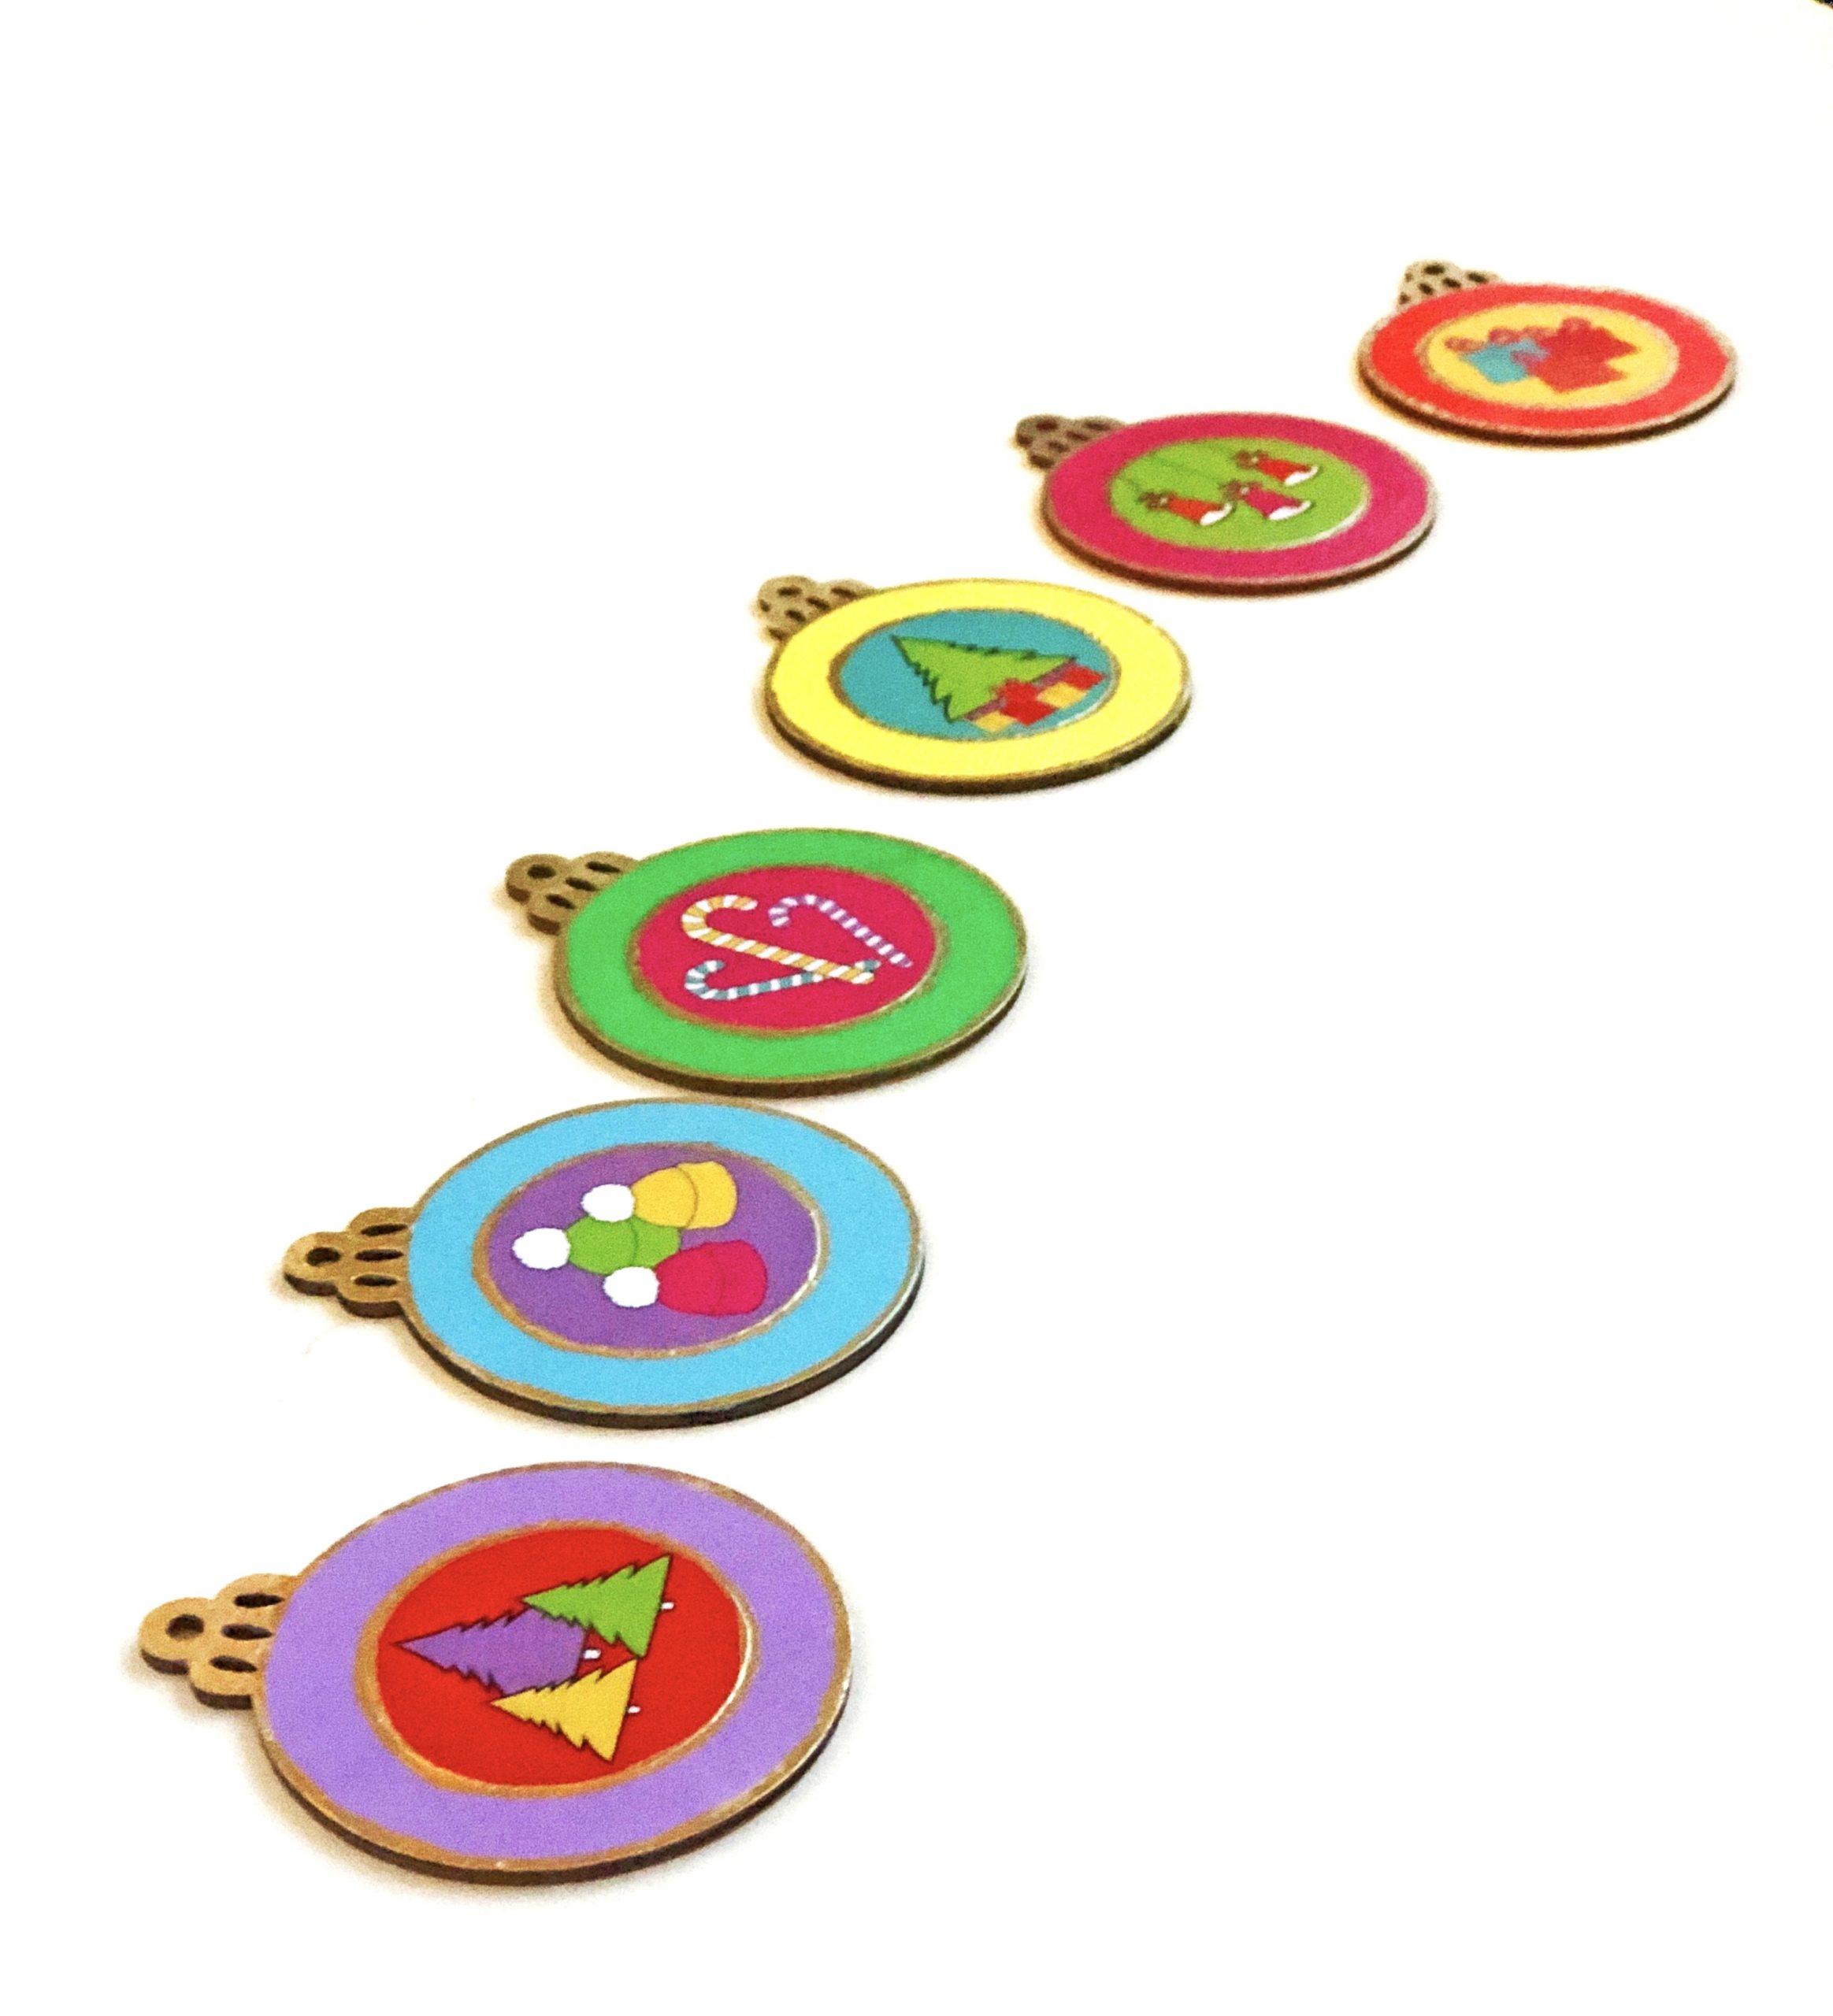 DIY decoupage ornaments in rainbow colors